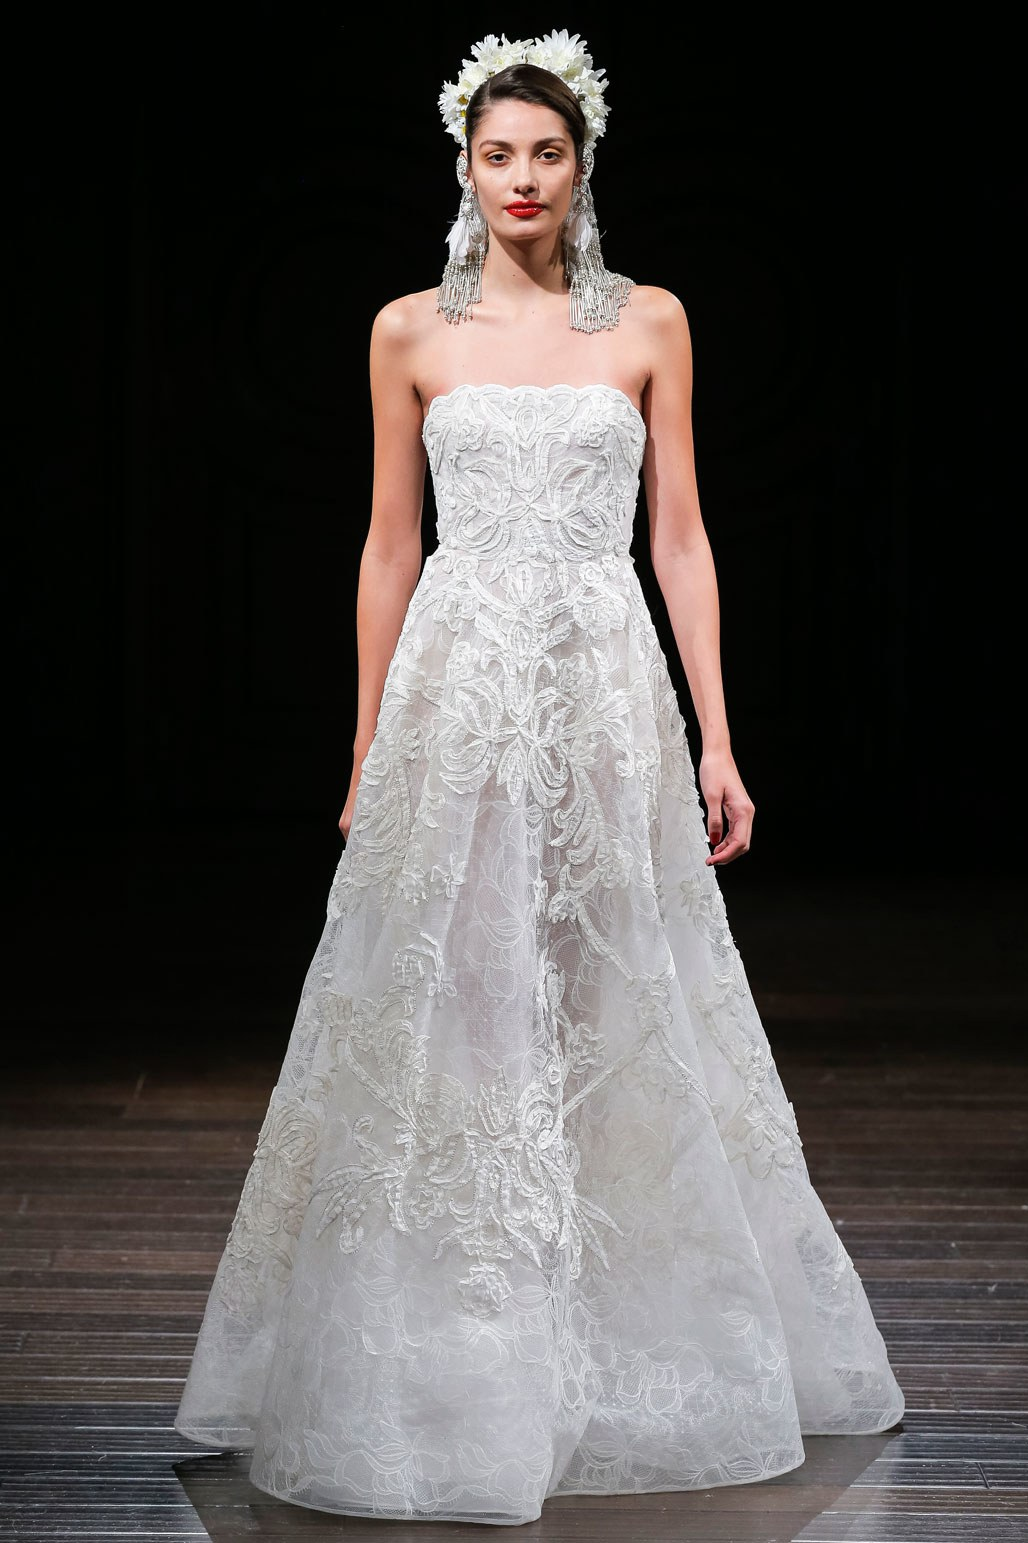 Fall 2018 Wedding Dresses by Naeem Khan - Arabia Weddings